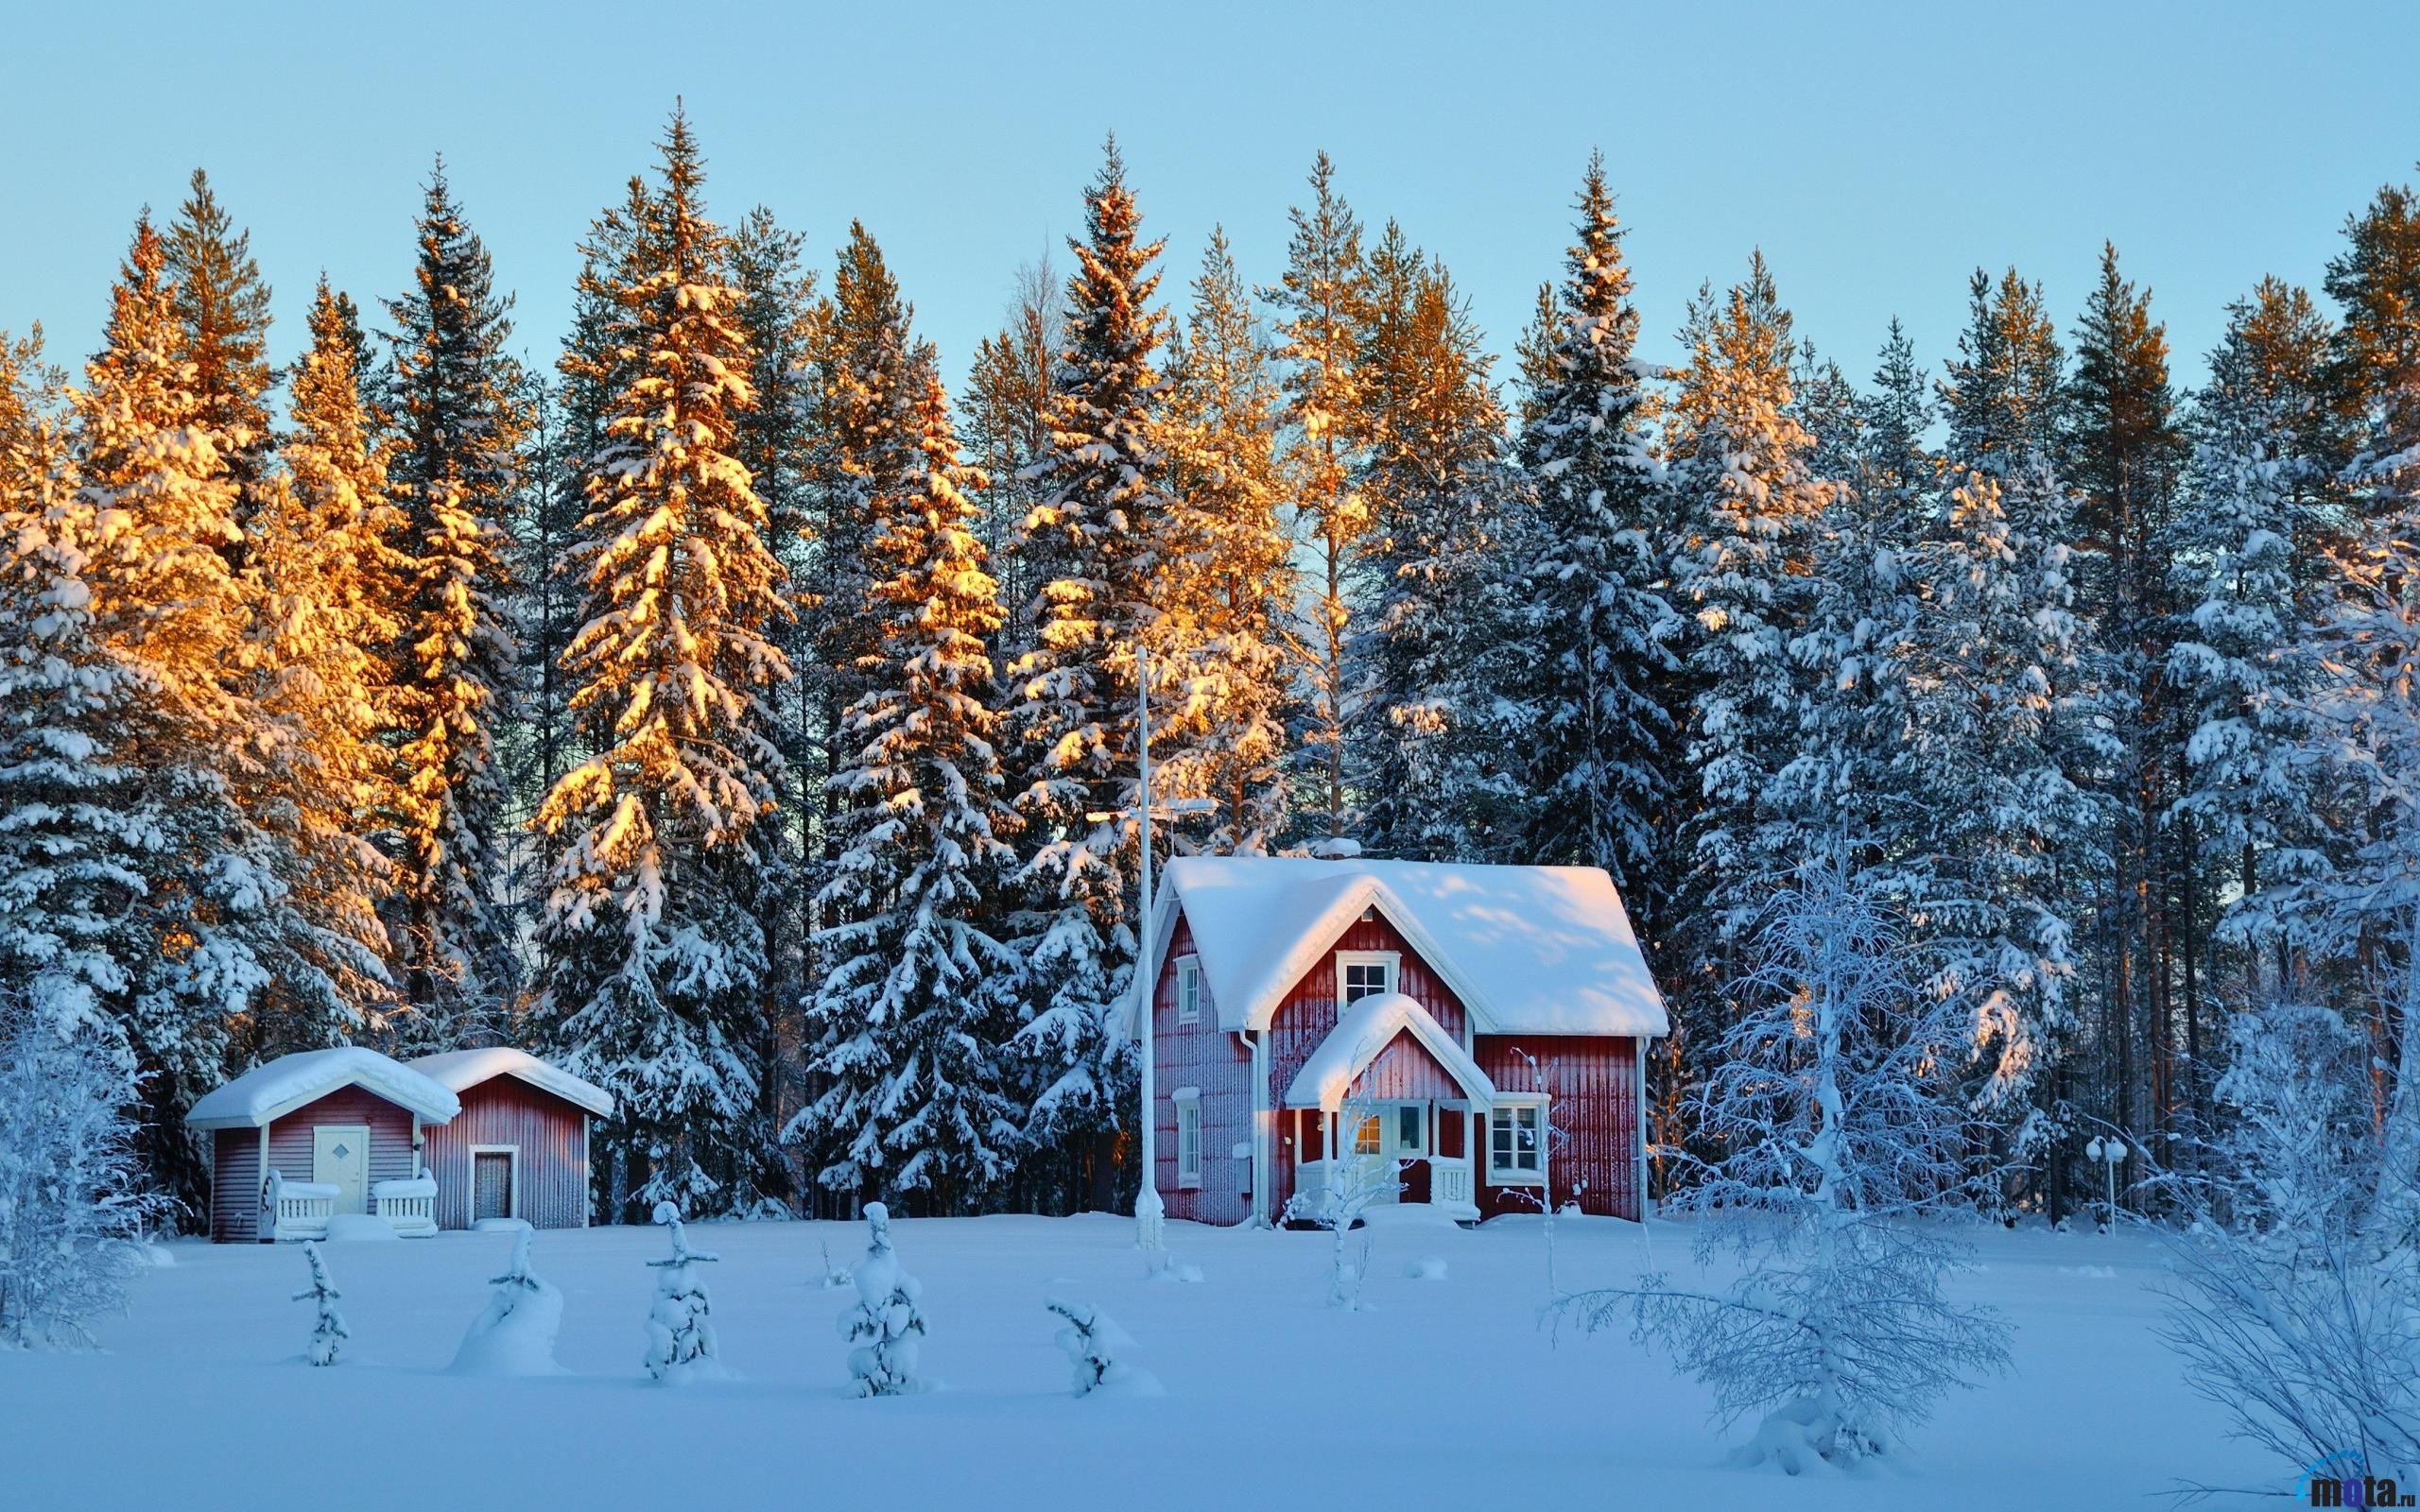 картинка домика в снегу верили